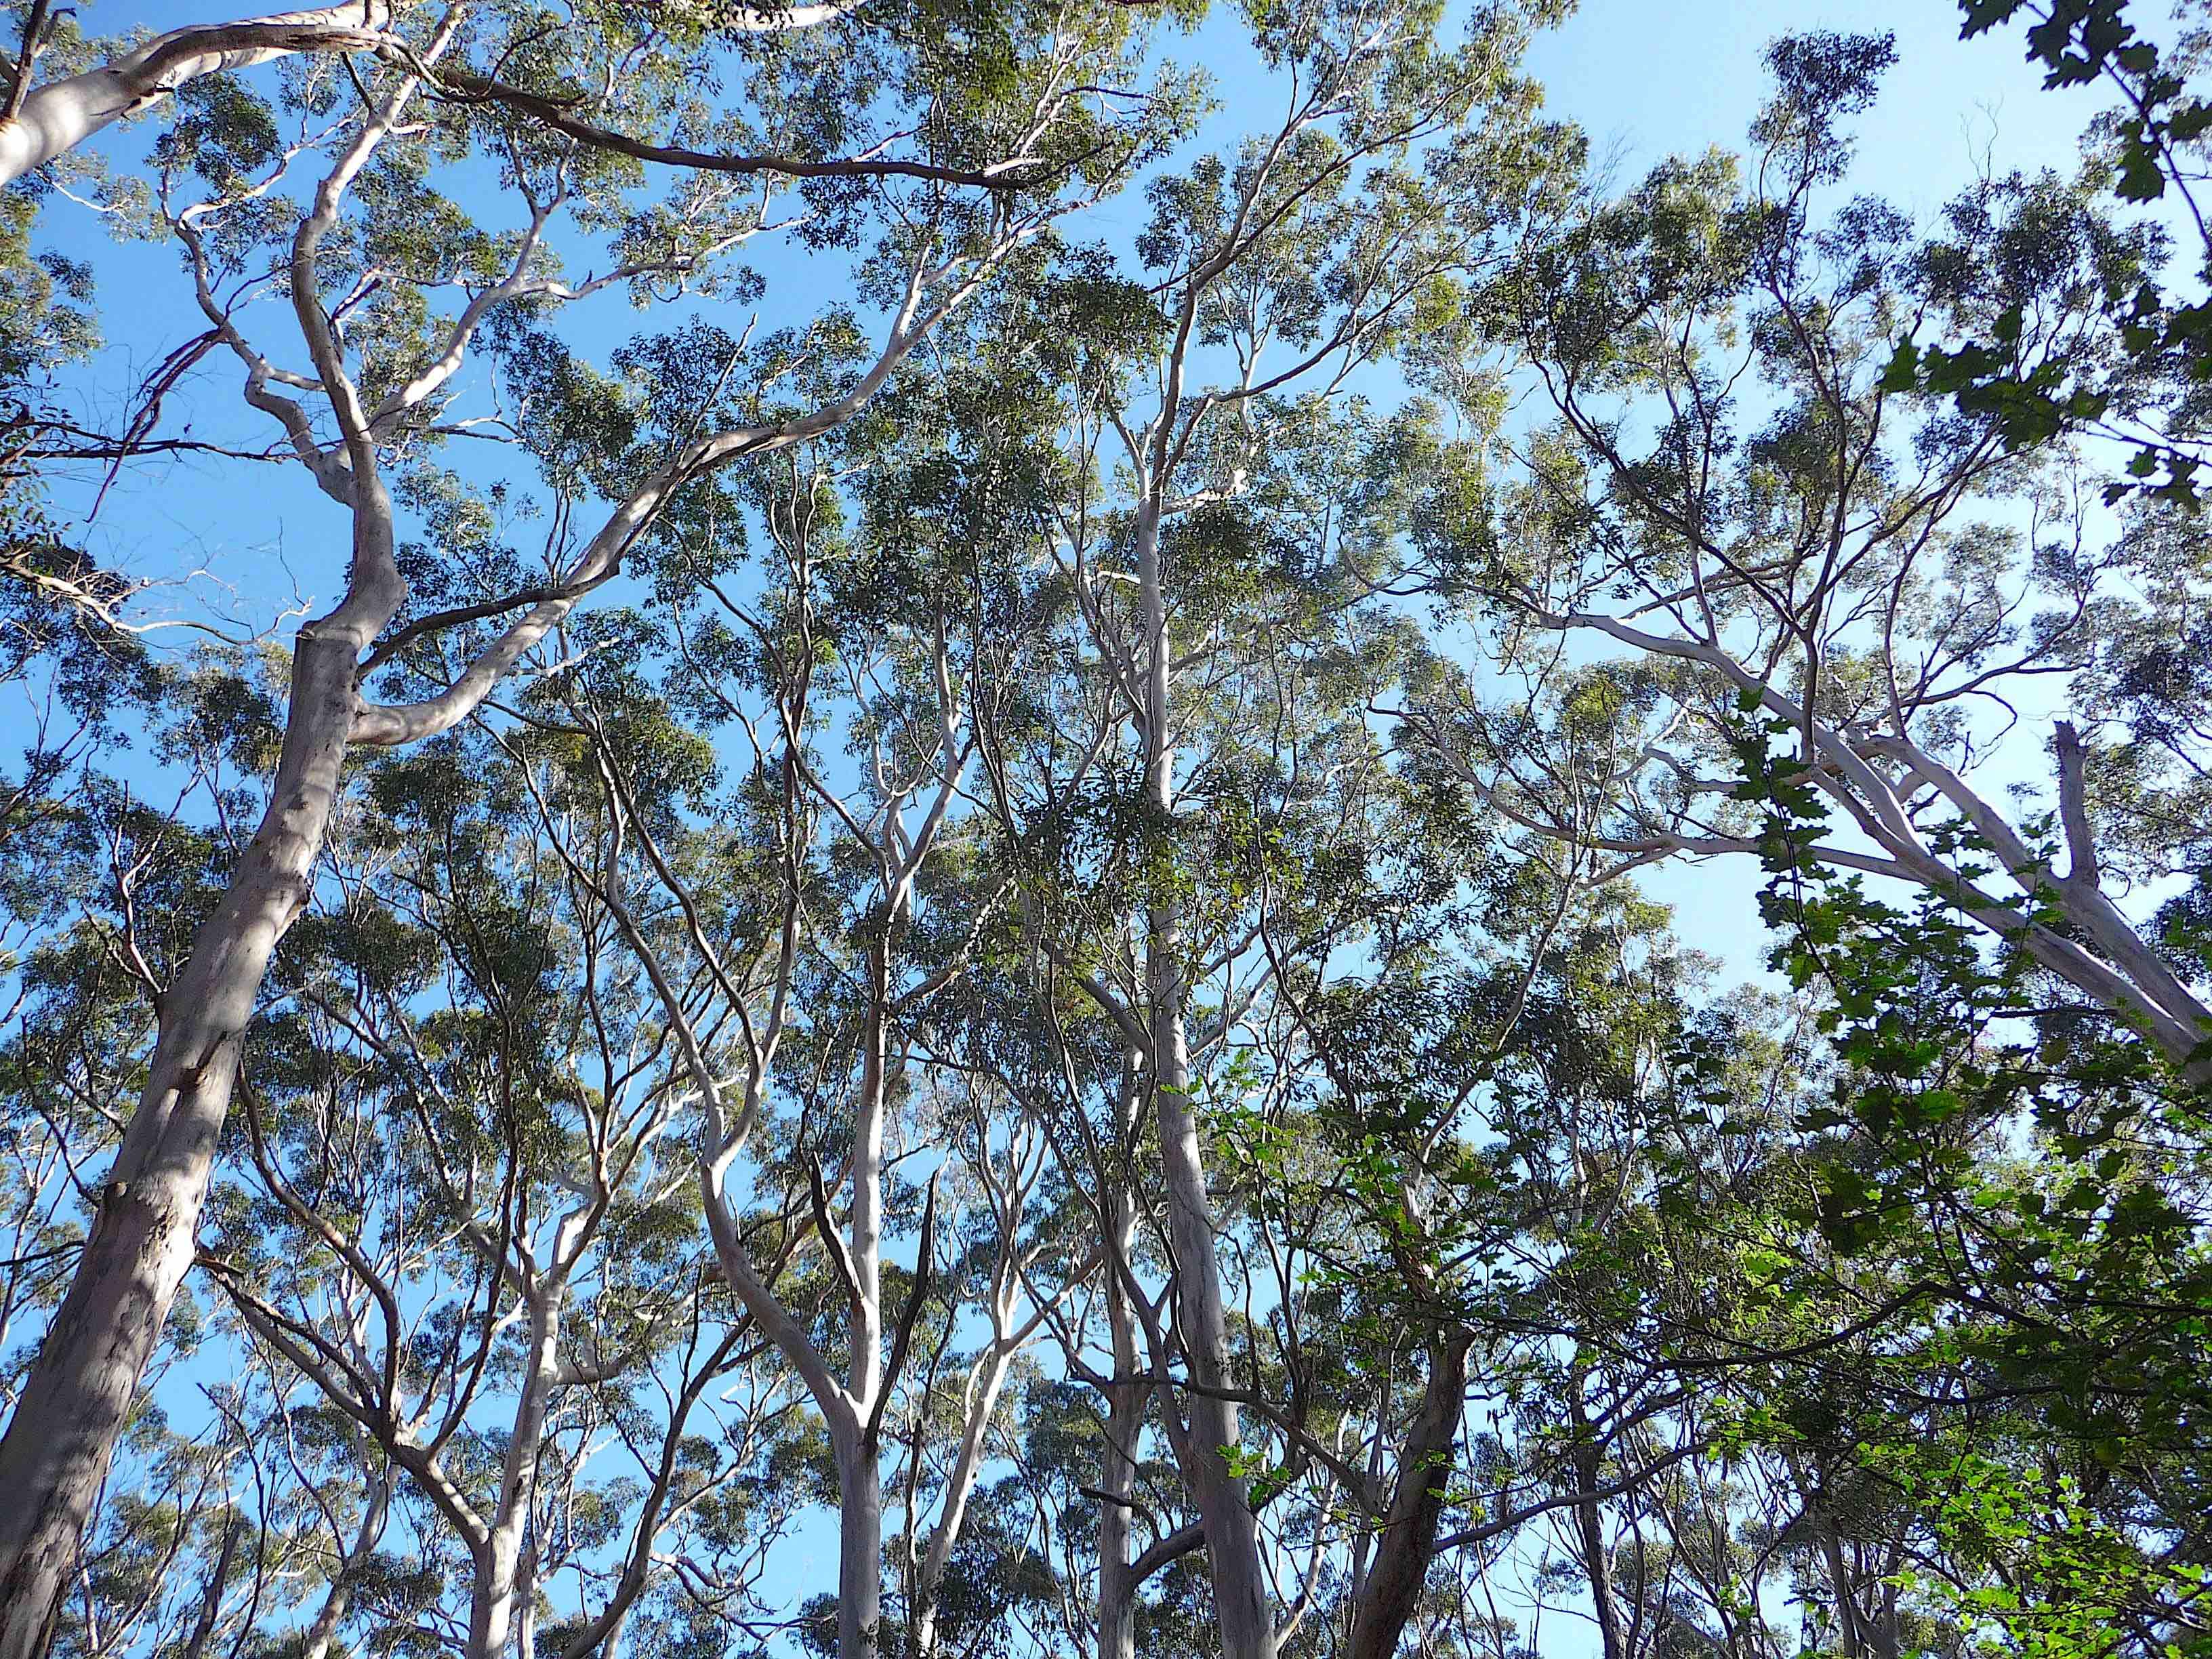 4.Karri trees